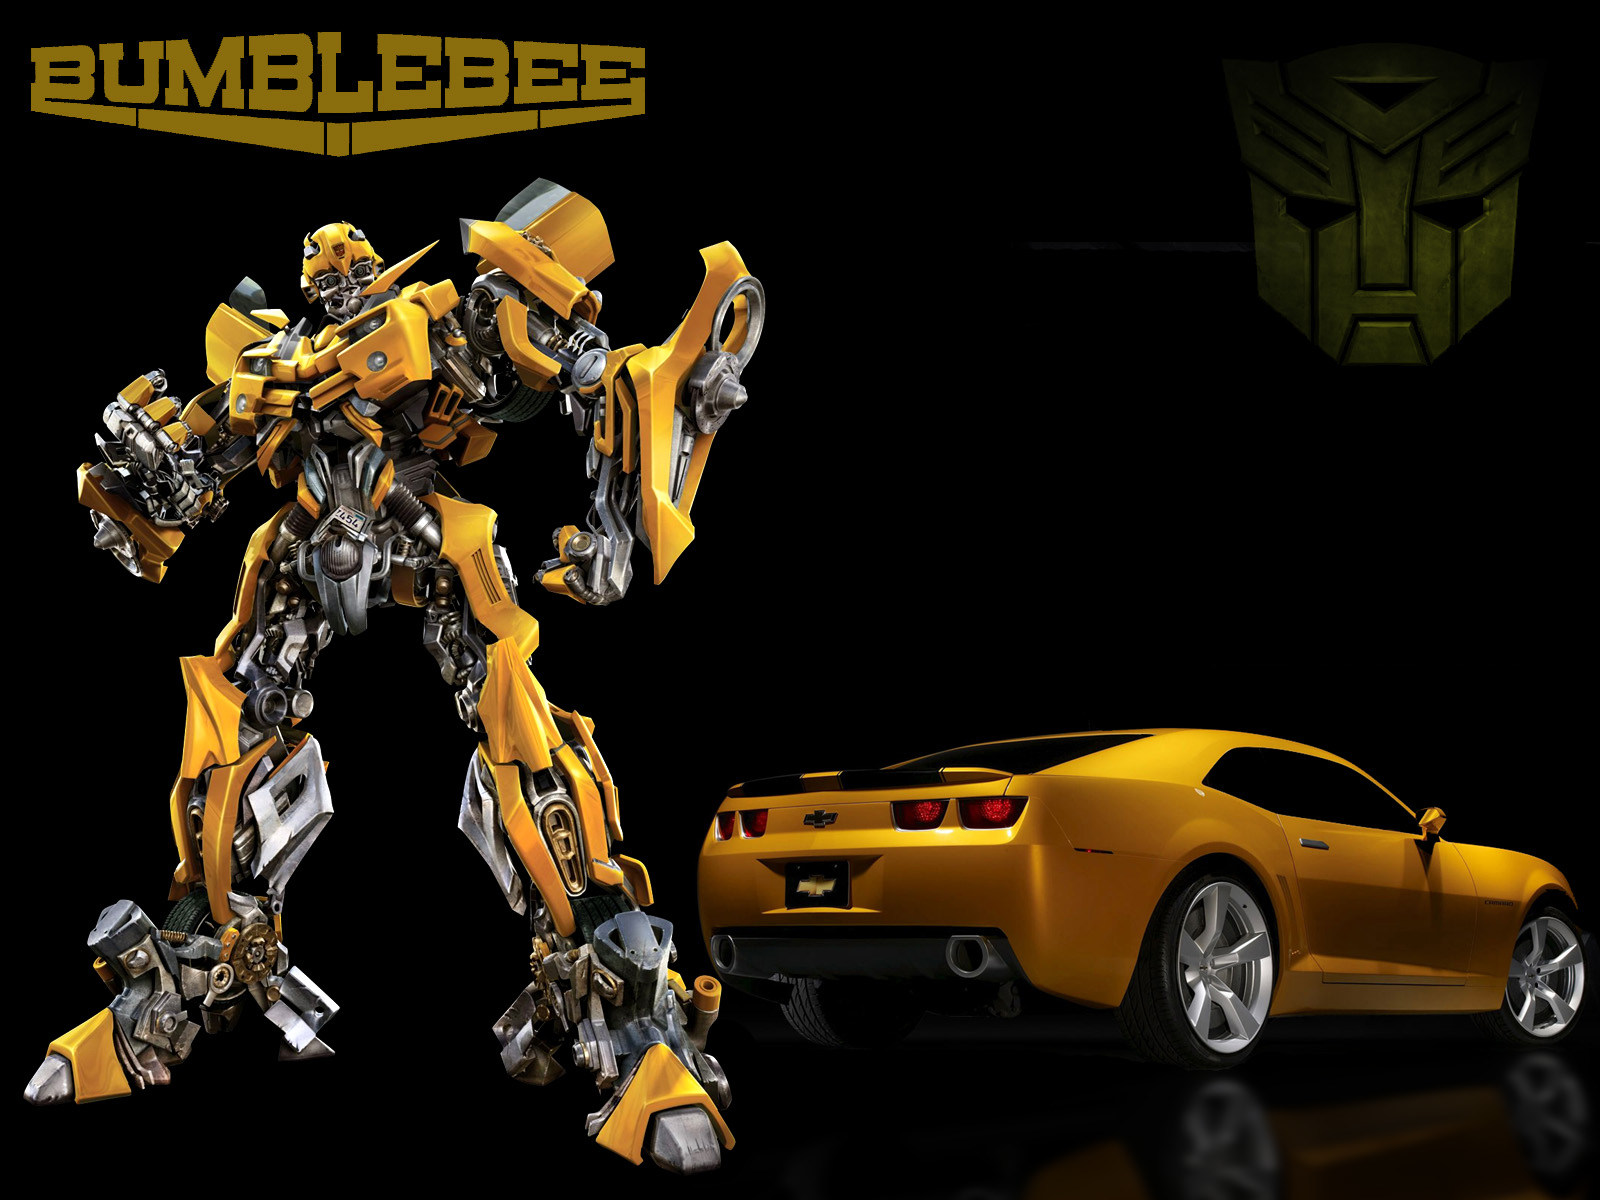 Download Transformers Movie wallpaper Transformers movie 5 1600x1200